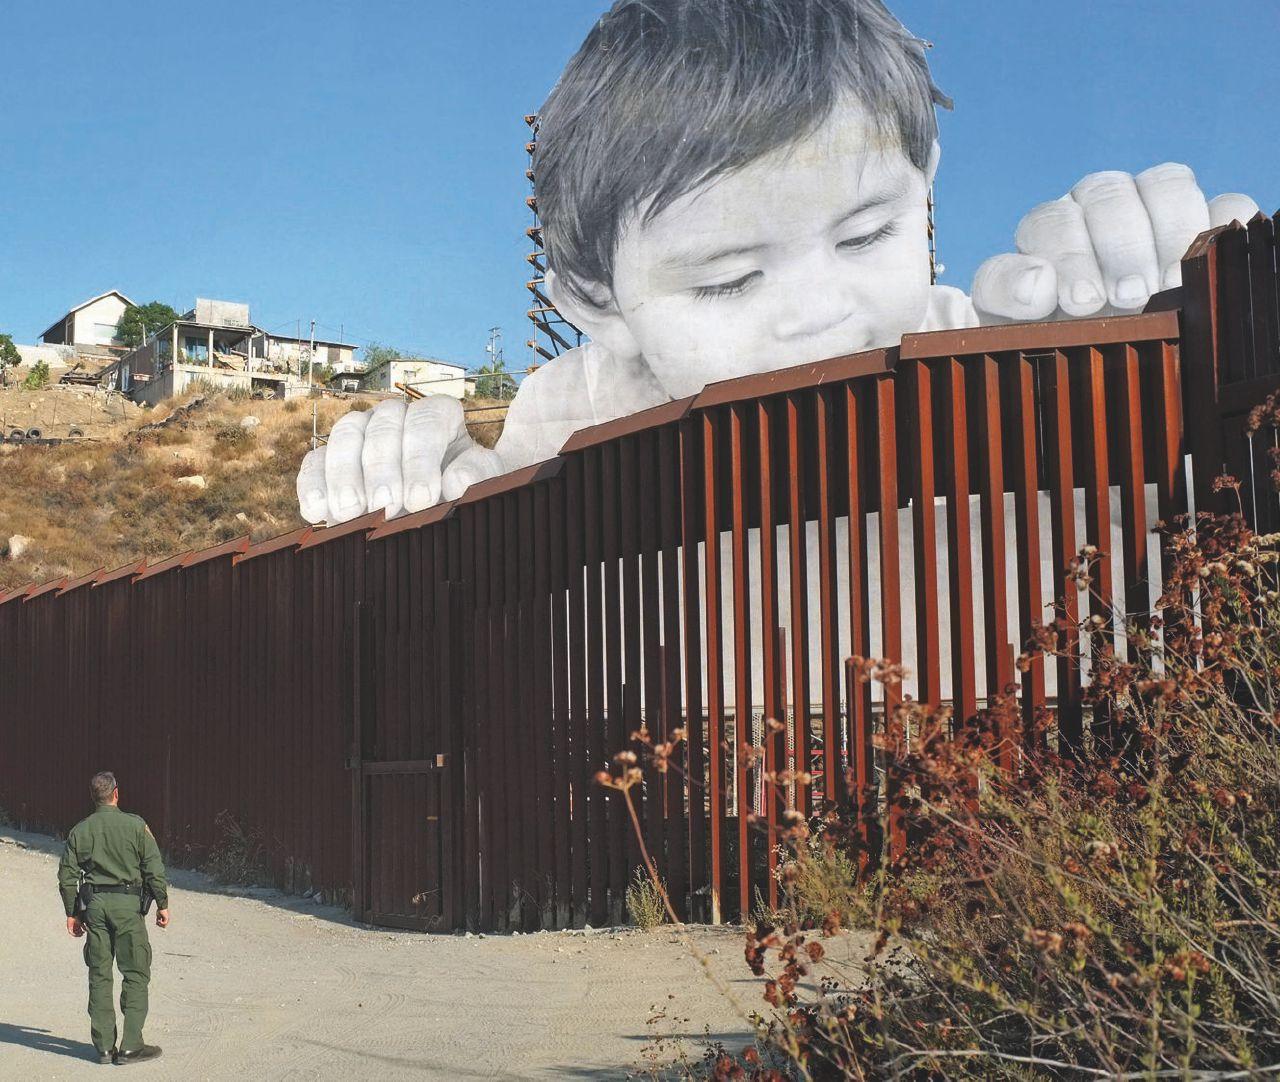 """Basta definirla migrazione, questa è una vera diaspora"""